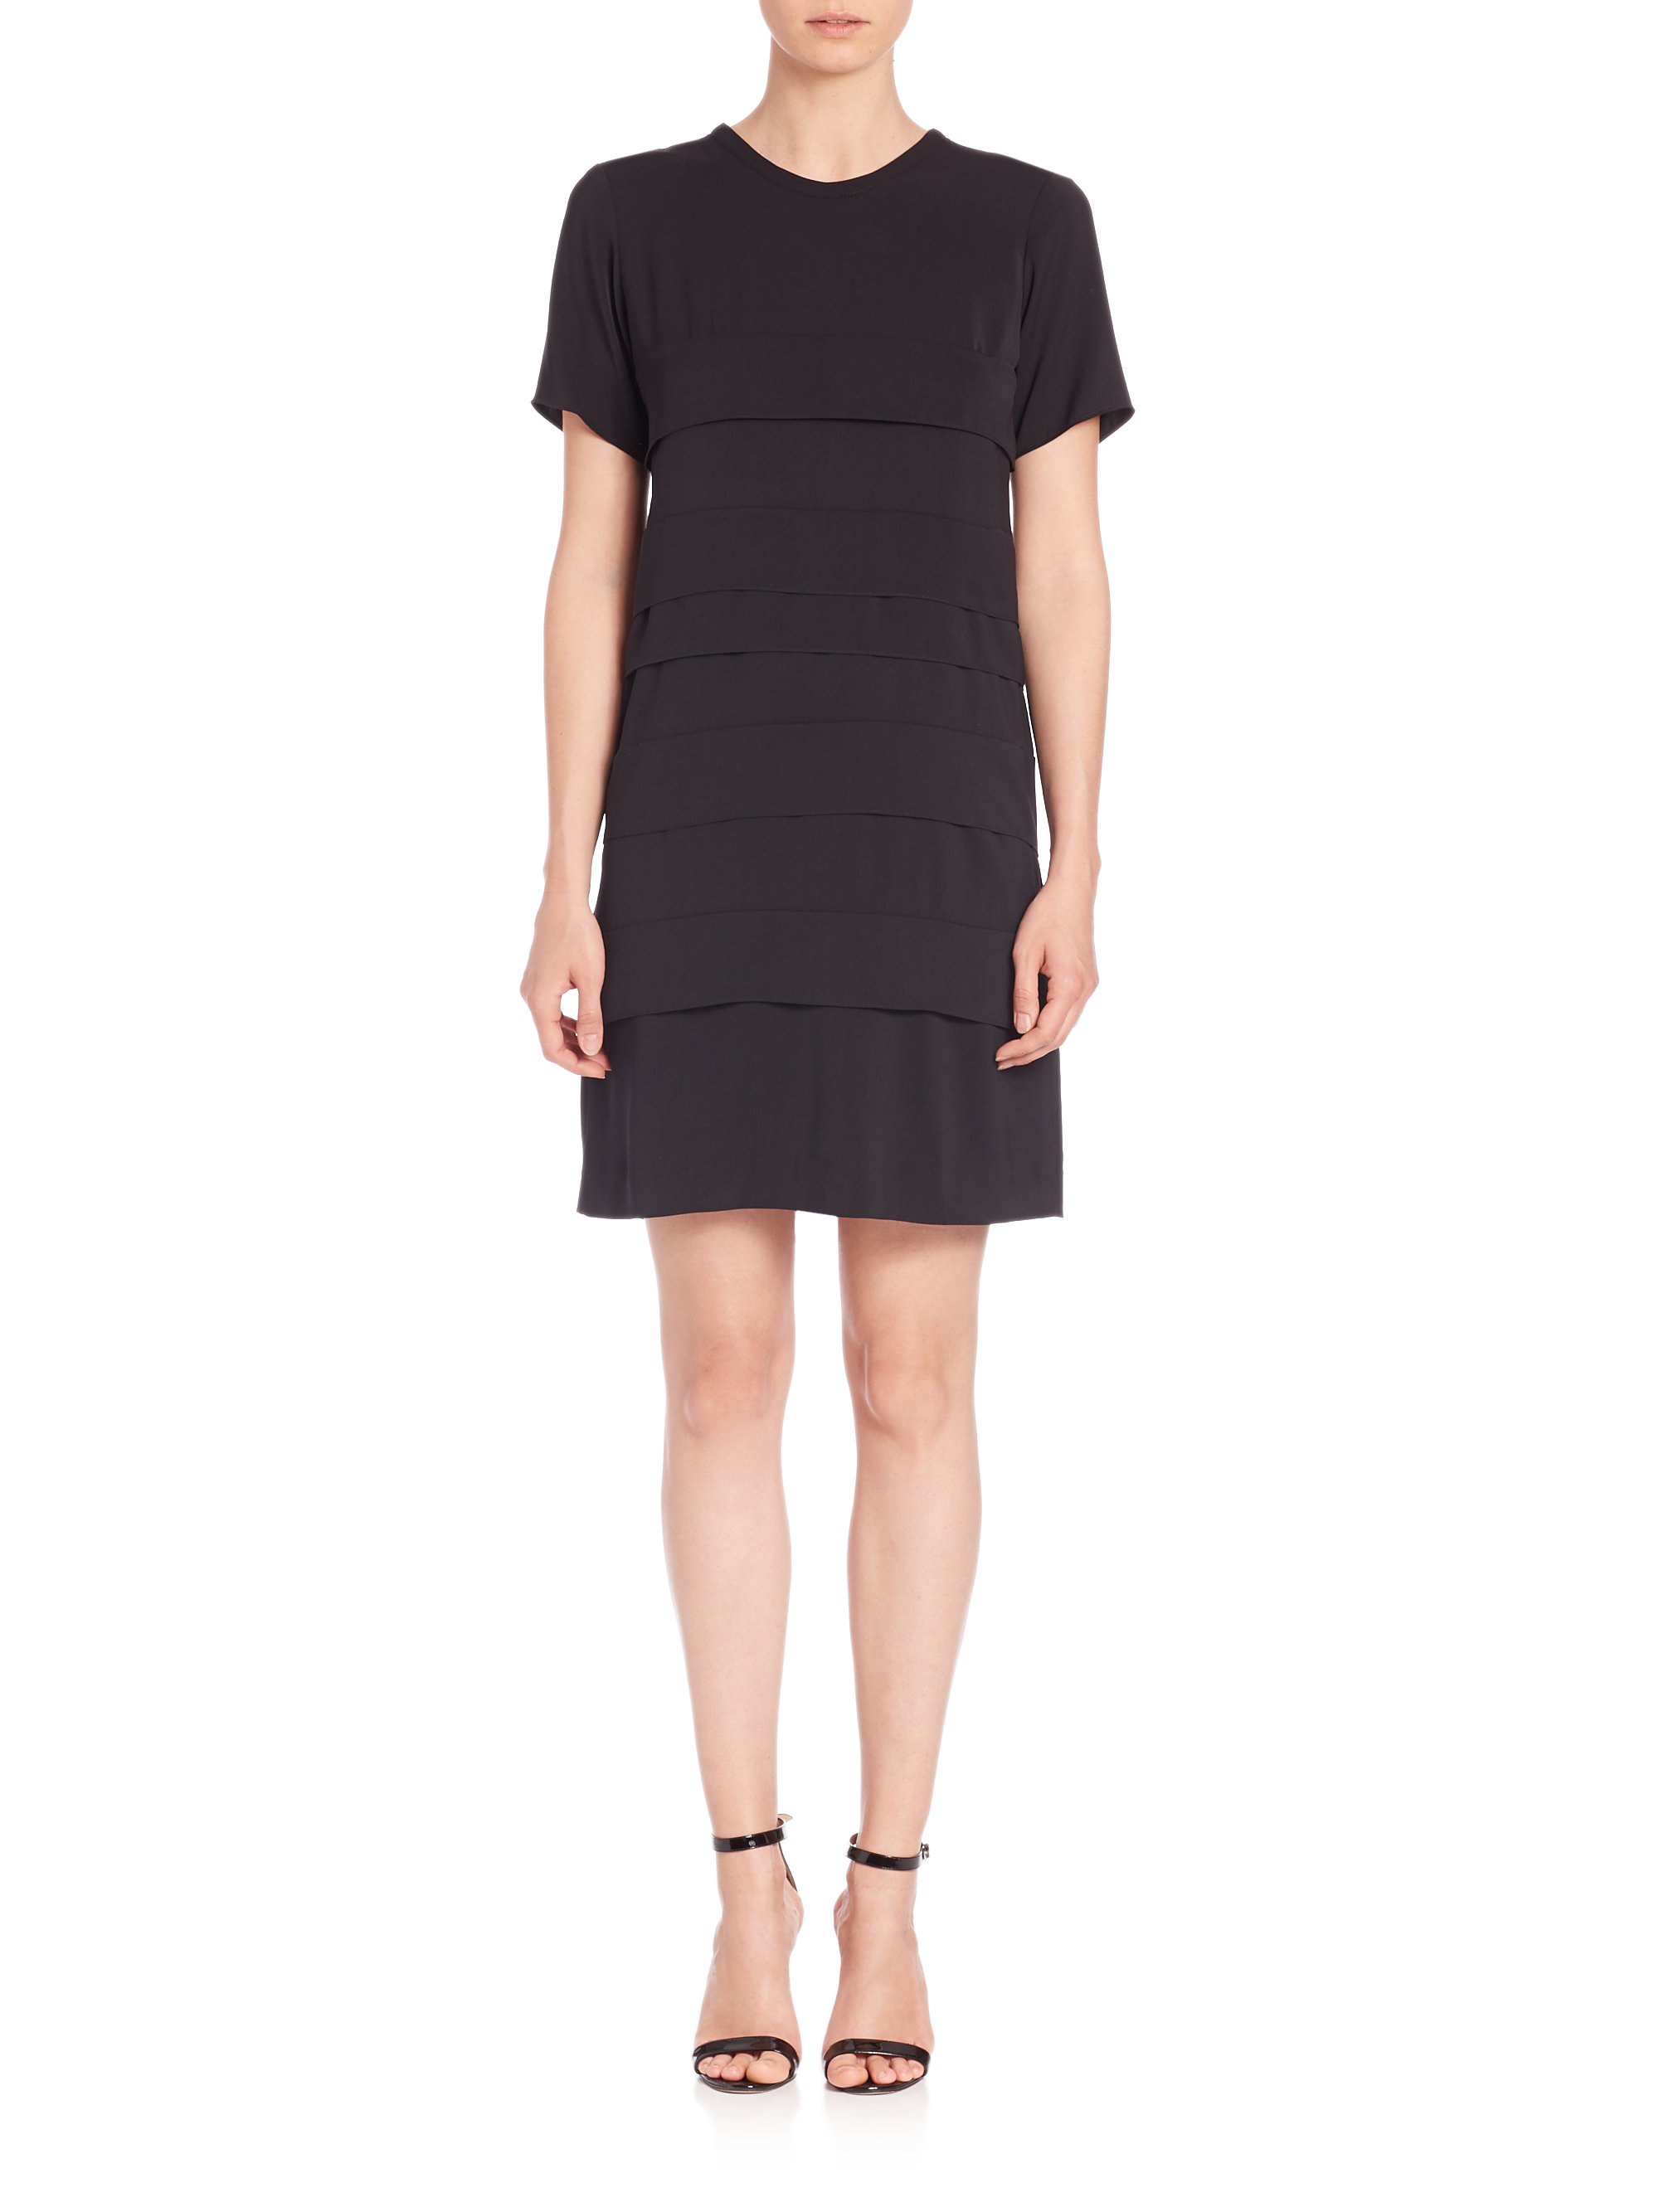 Sonia by sonia rykiel Charmeuse Paneled Dress in Black